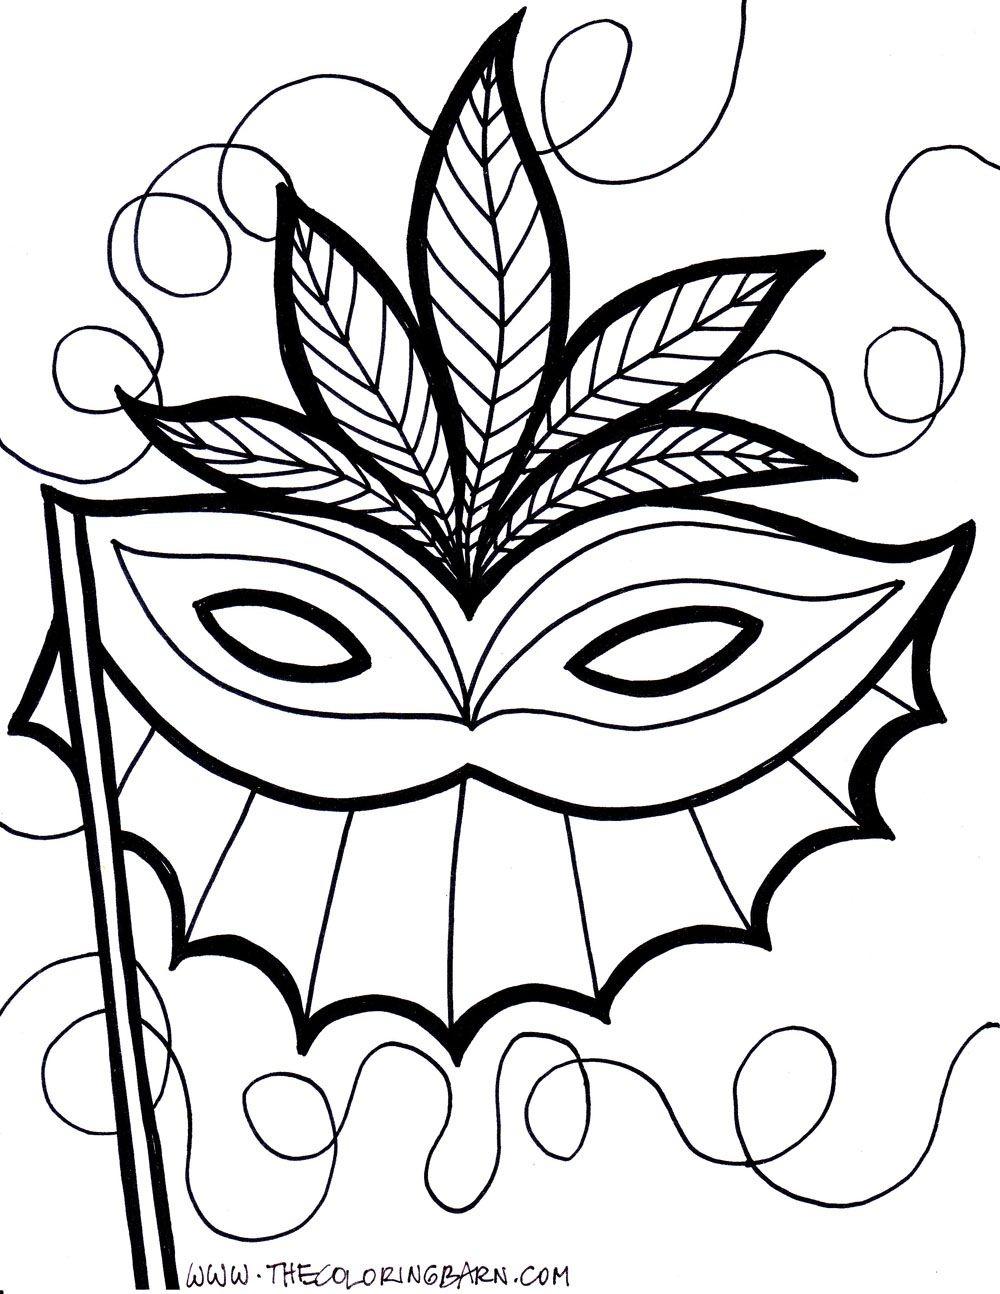 Pinelyssanda Desertsong On Embroidery Inspiration | Coloring - Free Printable Mardi Gras Masks